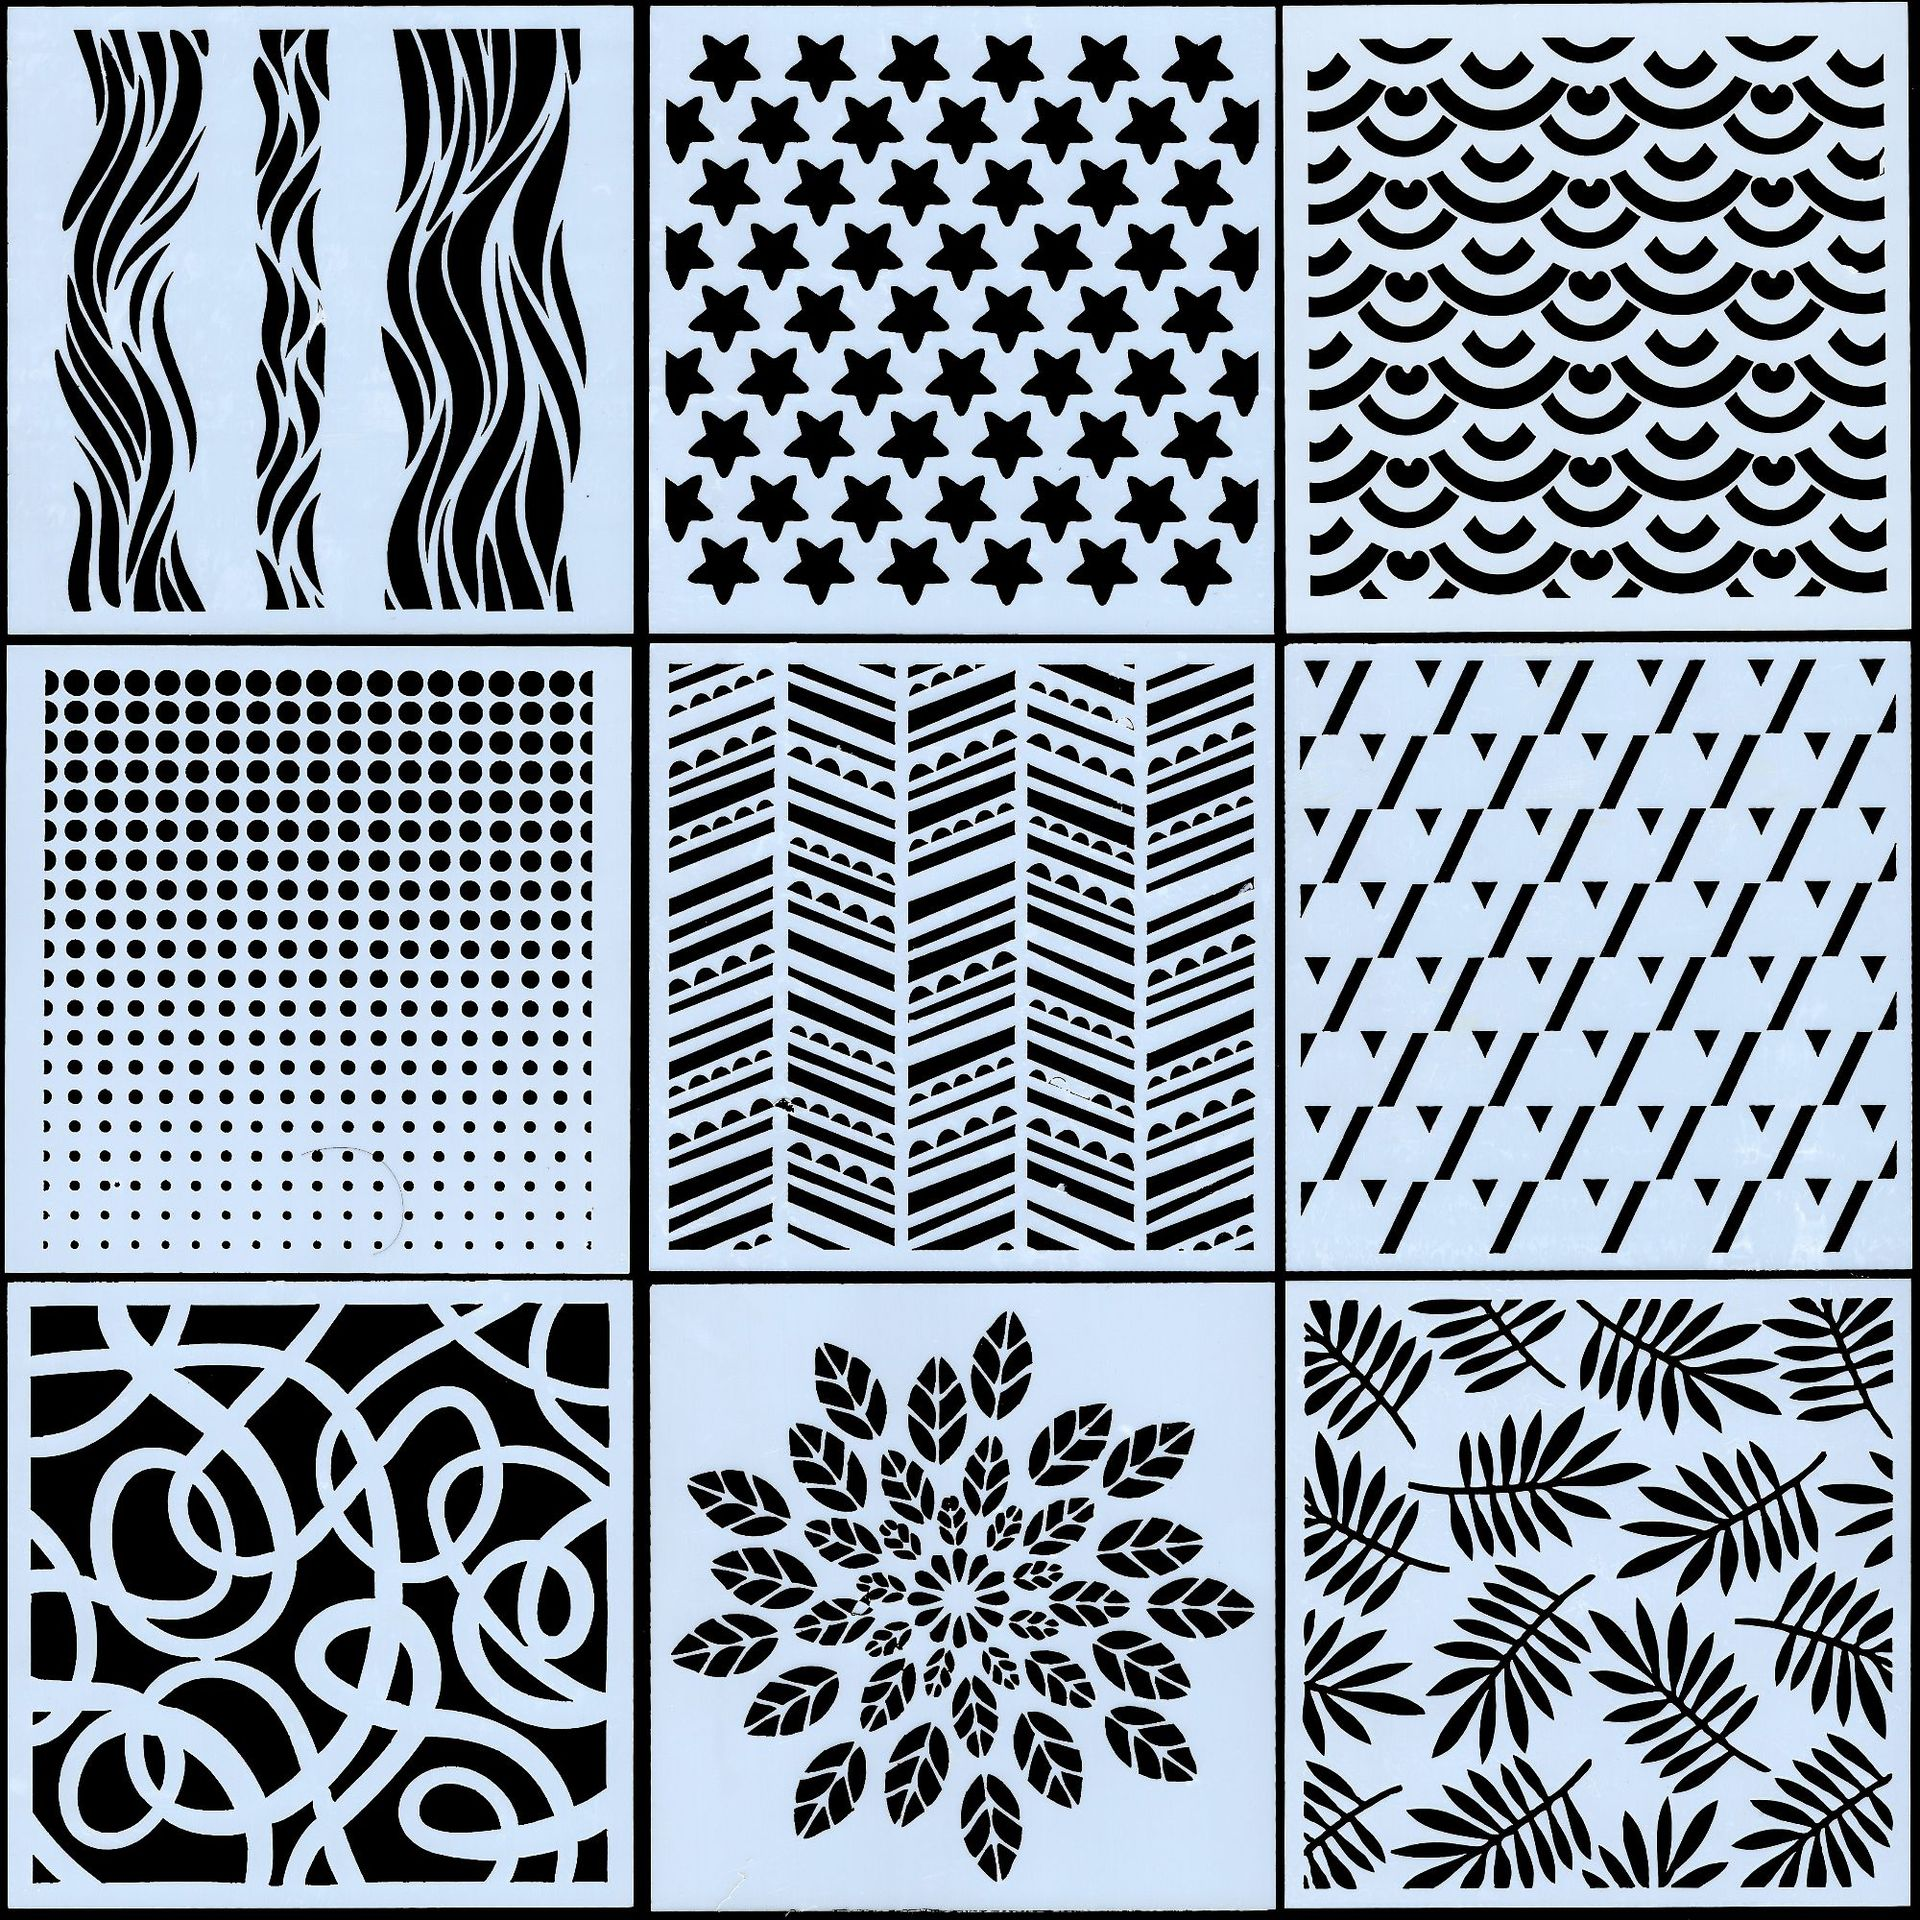 9Pcs/Set 13cm Star Dot Wavy Texture DIY Craft Layering Stencils Painting Scrapbooking Stamping Embossing Album Card Template